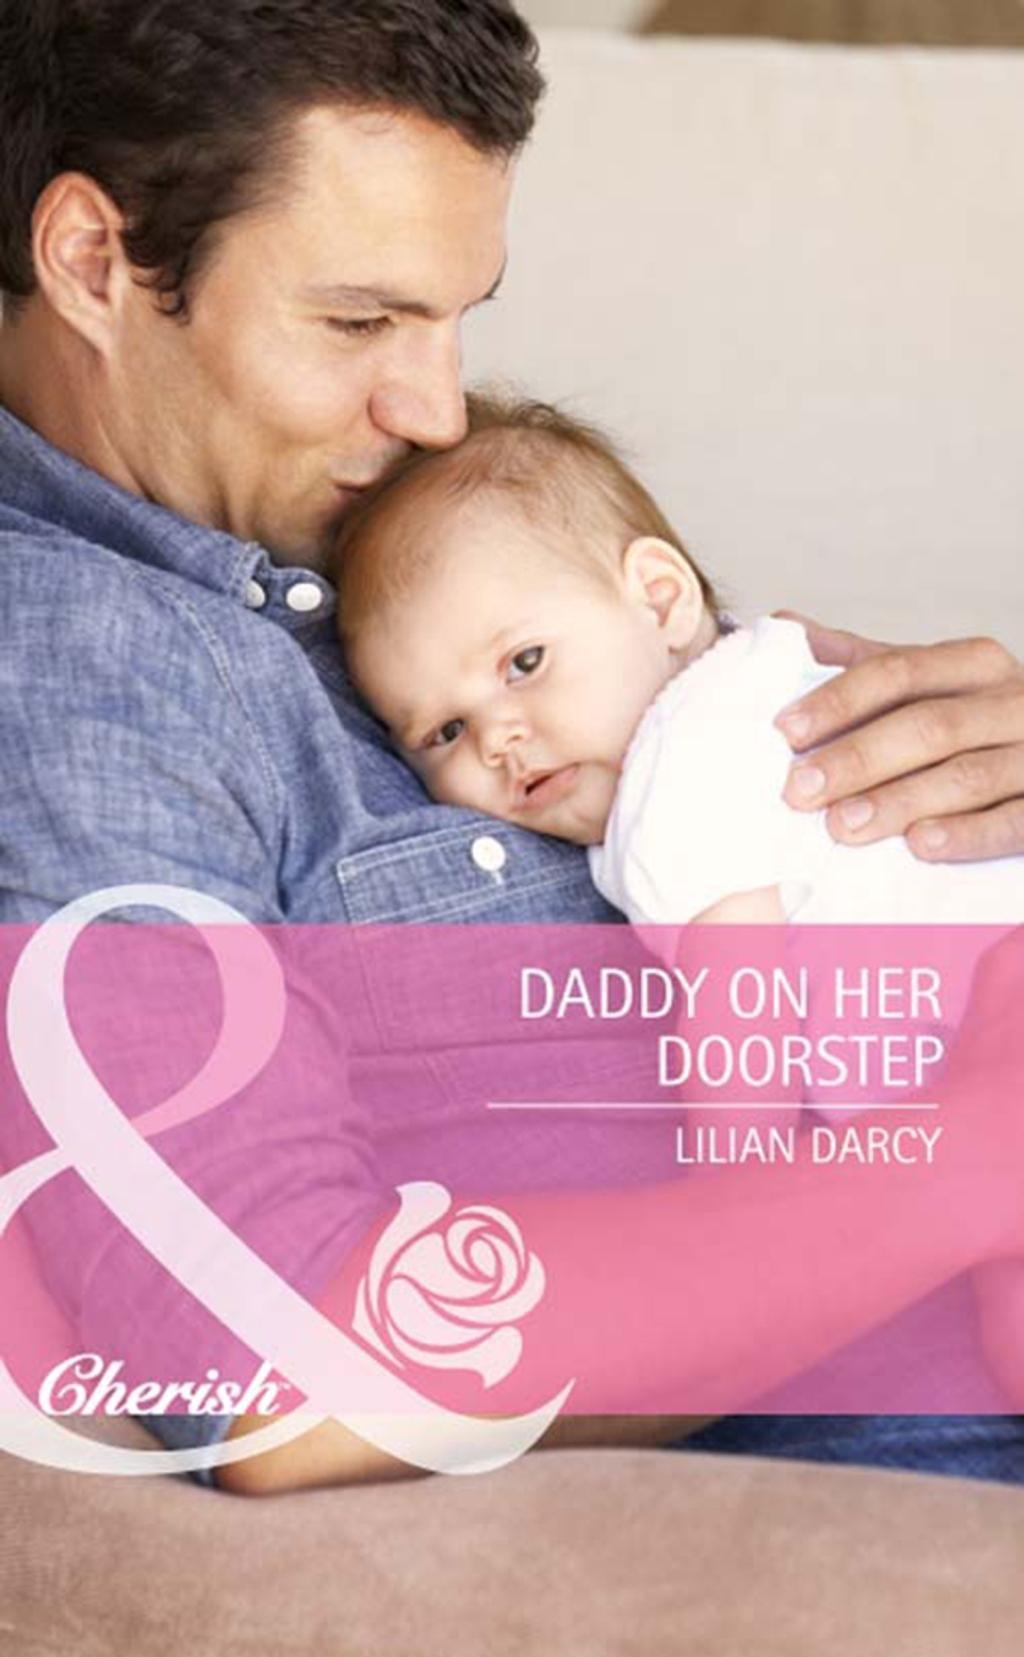 Daddy on Her Doorstep (Mills & Boon Cherish) (McKinley Medics, Book 1)